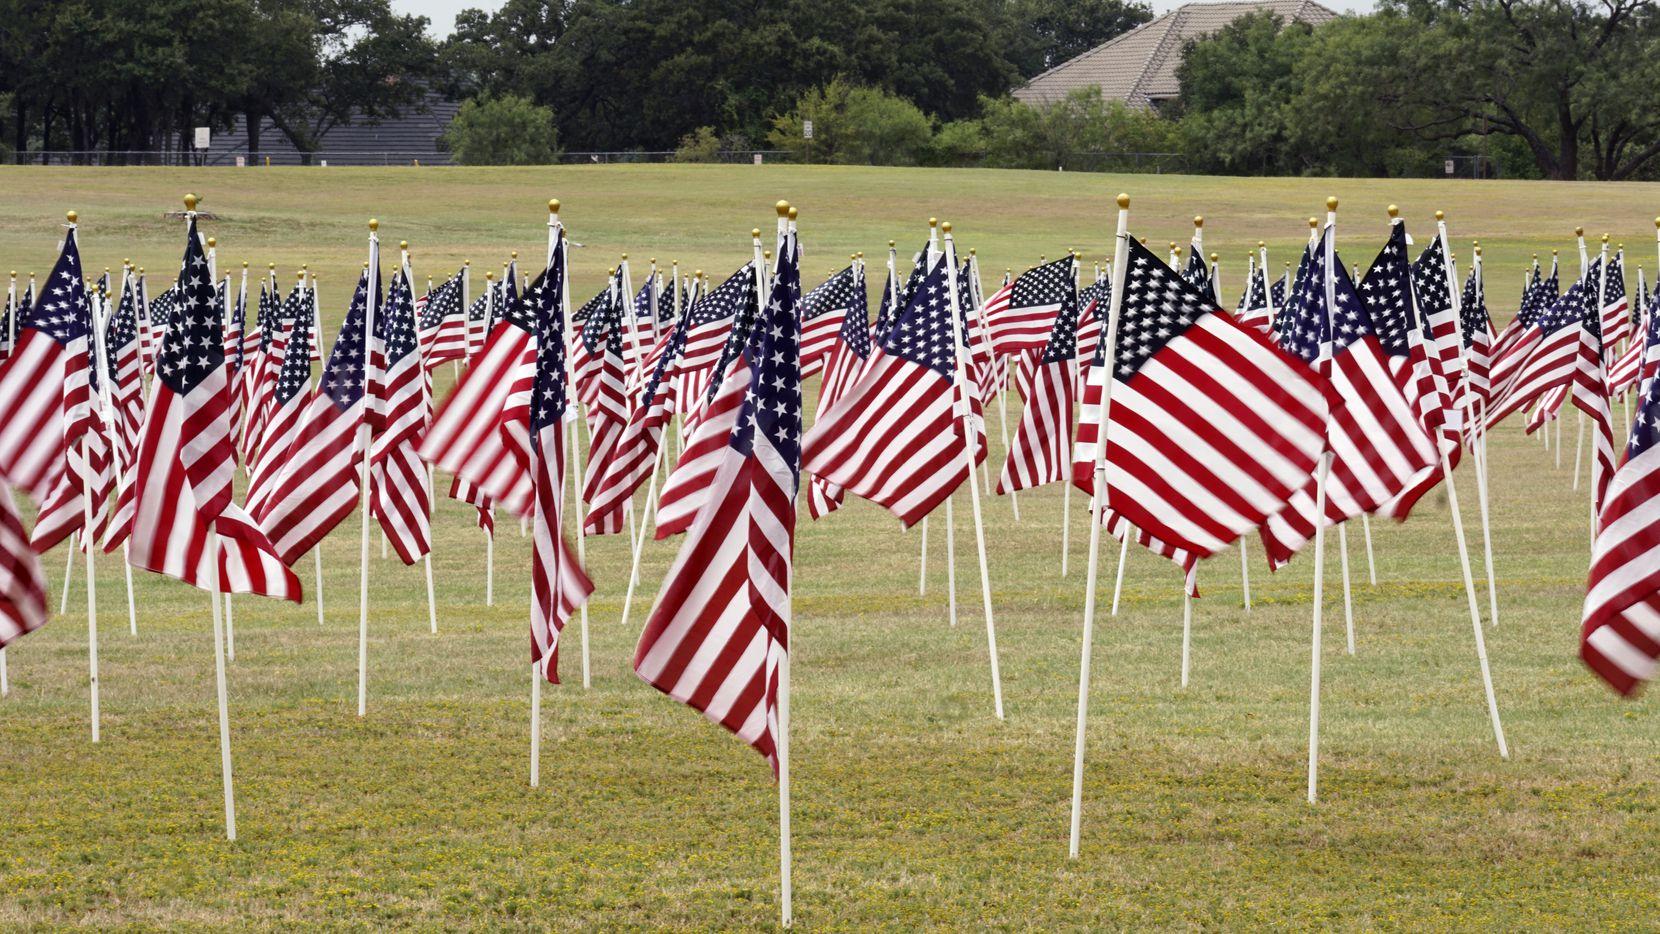 911 Memorial at Veterans Park in Arlington, Texas on Sunday, September 5, 2021.(Lawrence Jenkins/Special Contributor)